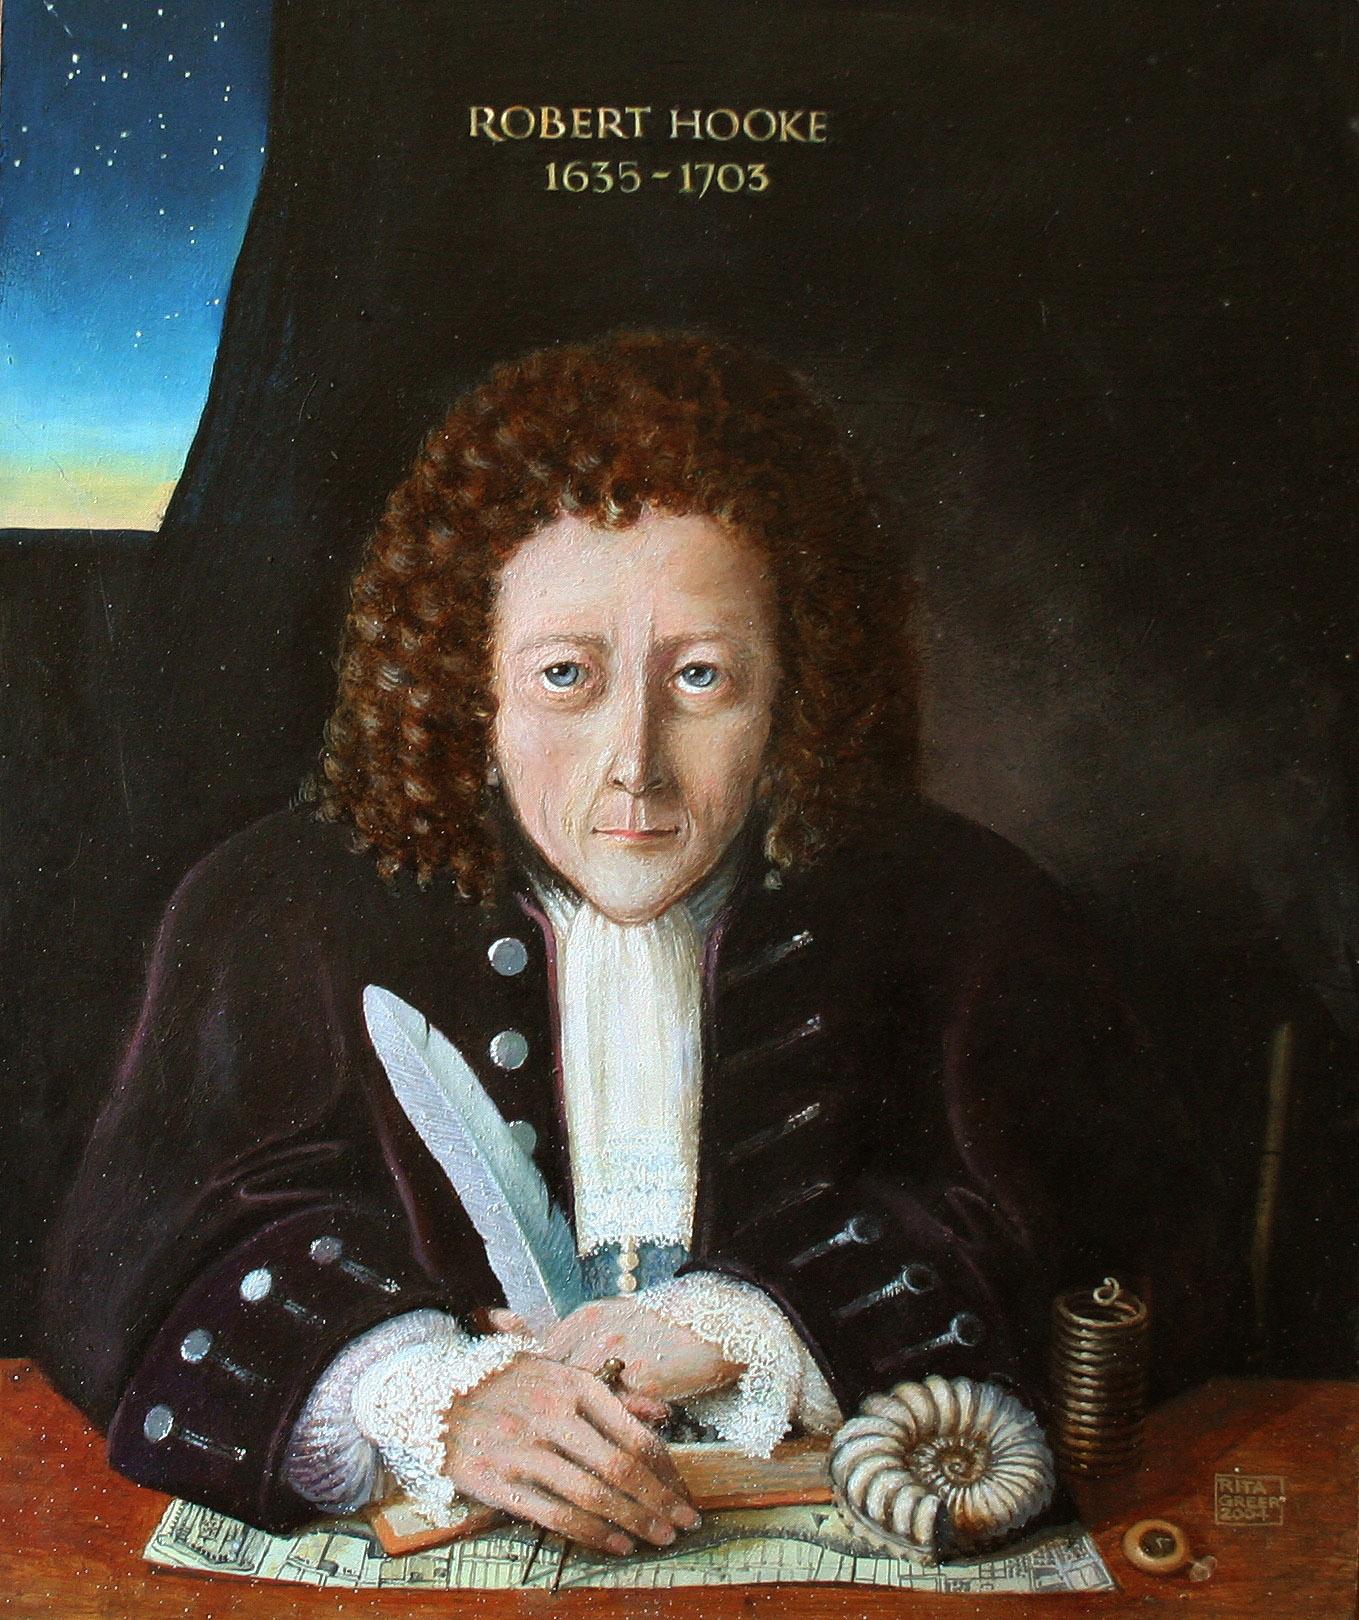 http://upload.wikimedia.org/wikipedia/commons/1/10/13_Portrait_of_Robert_Hooke.JPG